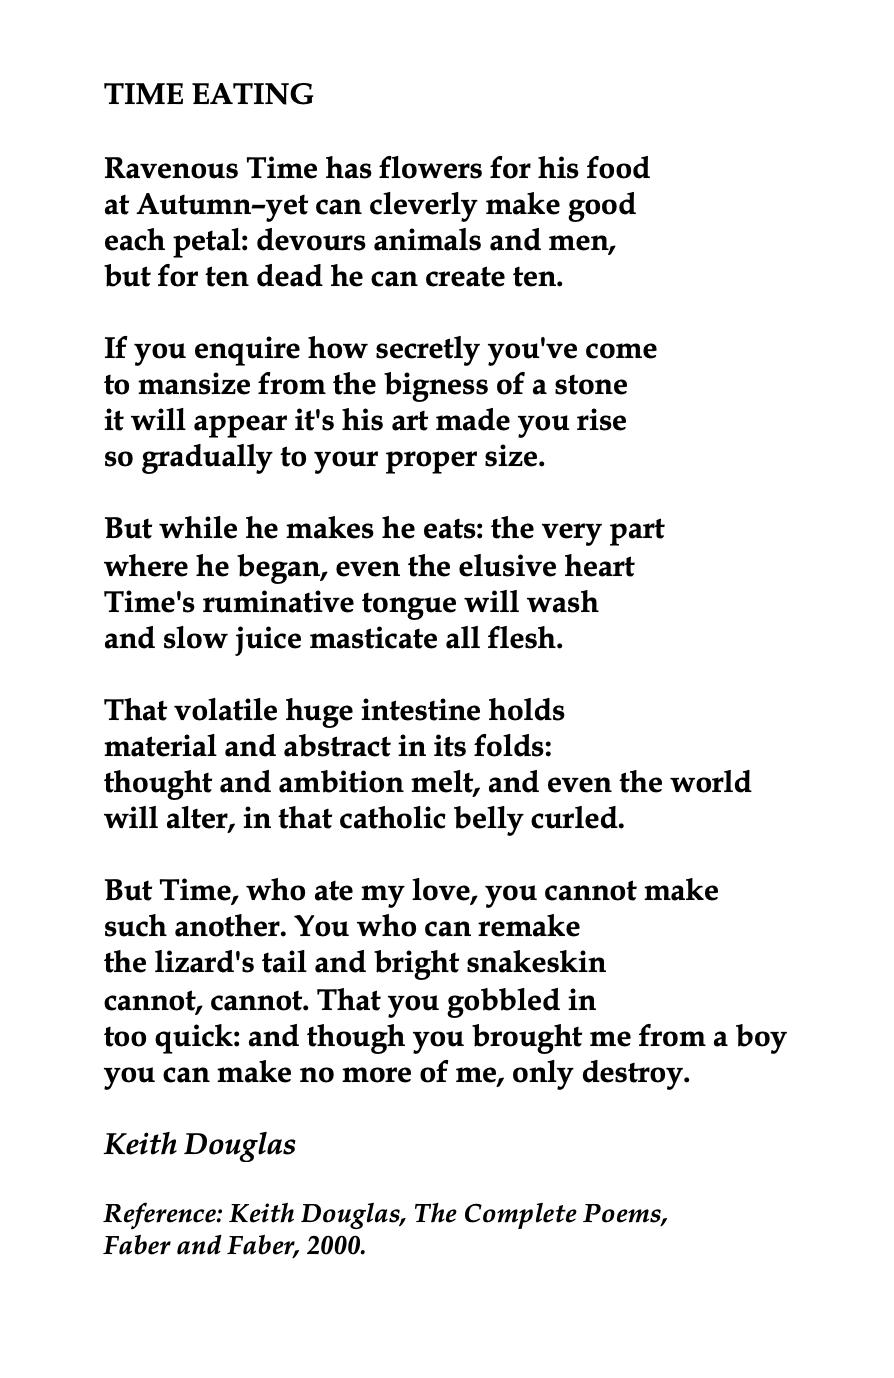 Keith Castellain Douglas Slam Poetry British Poets Poems